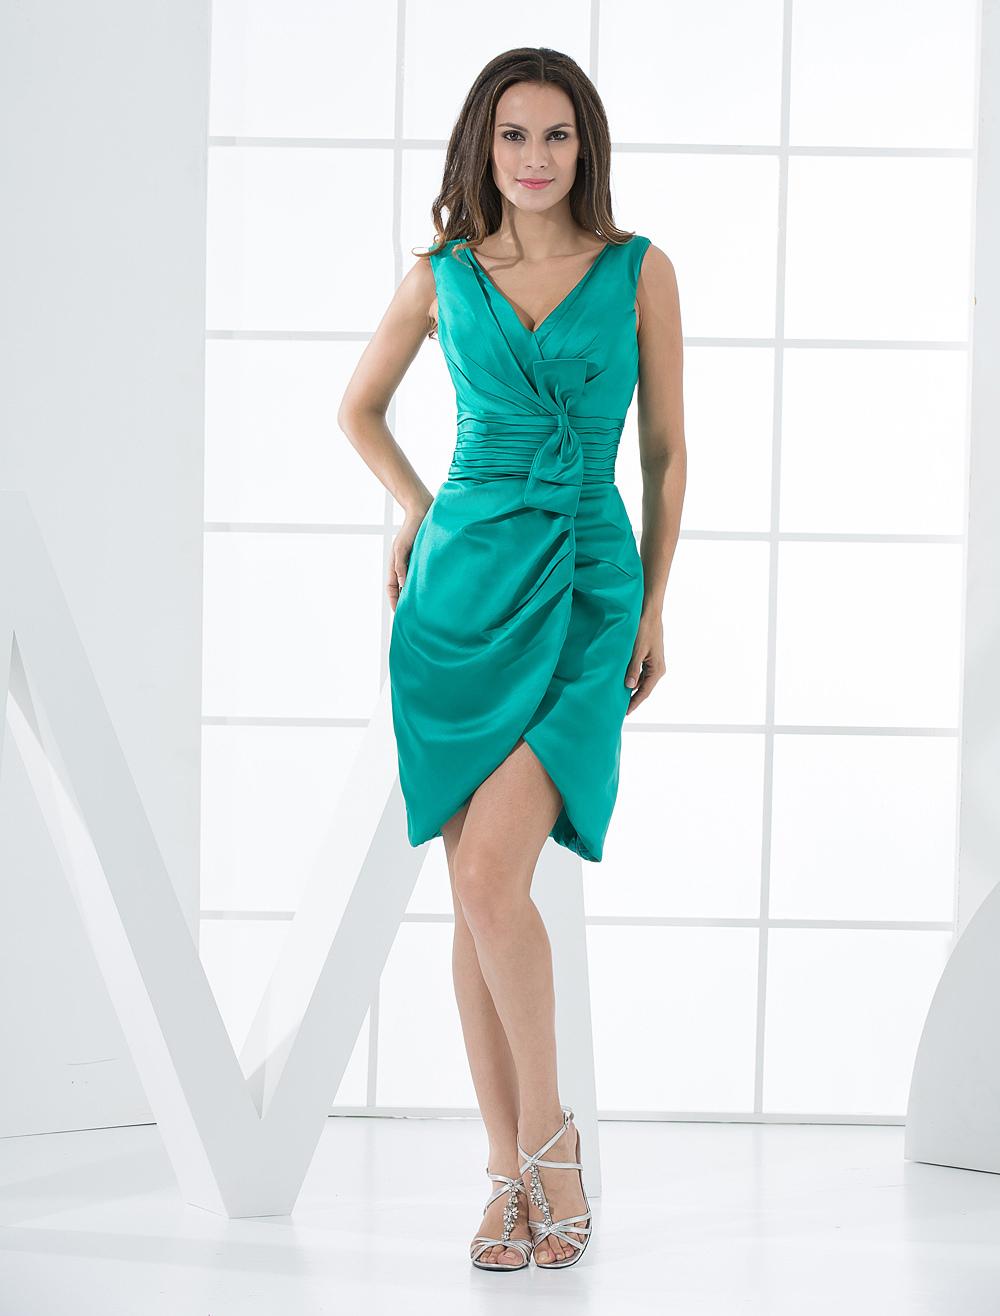 Blue Green Cocktail Dress Sheath V Neck Bow Satin Ruched Short Prom Dress